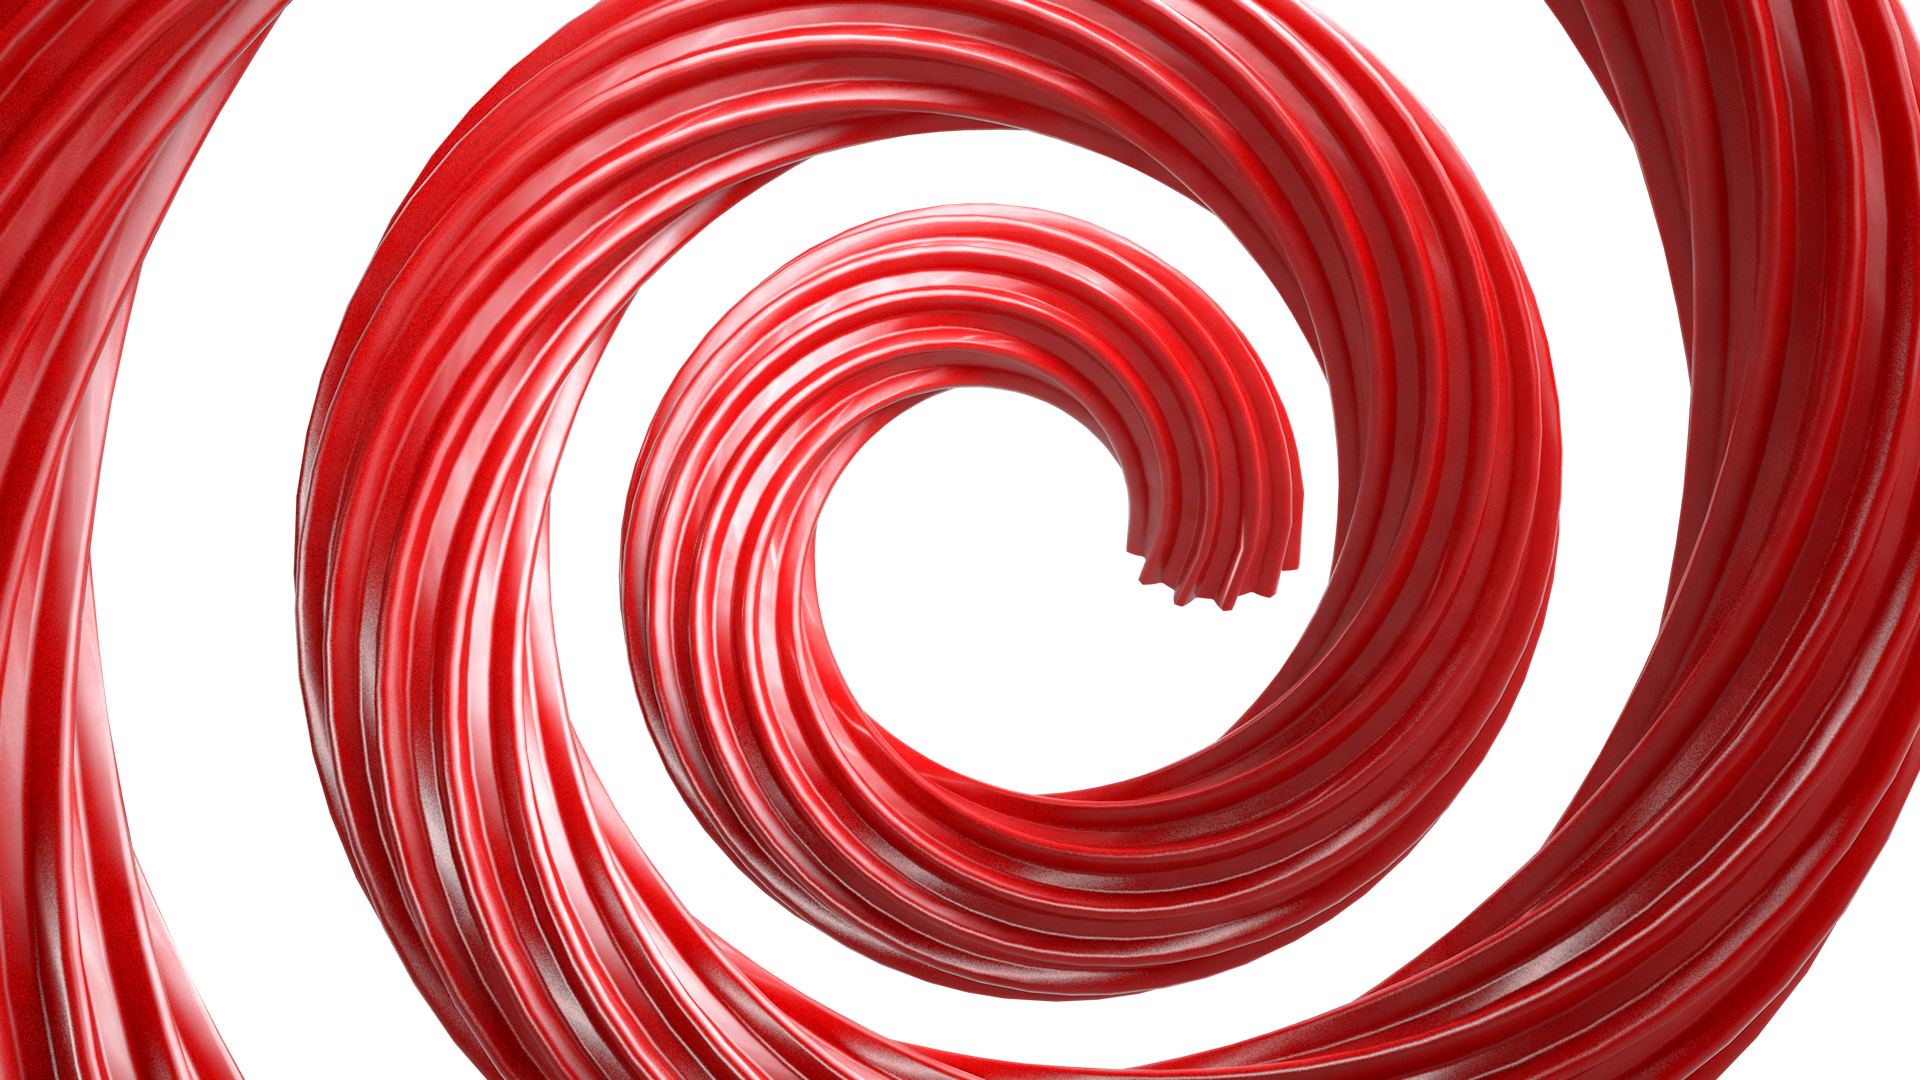 twizzlerspiralforweb.png